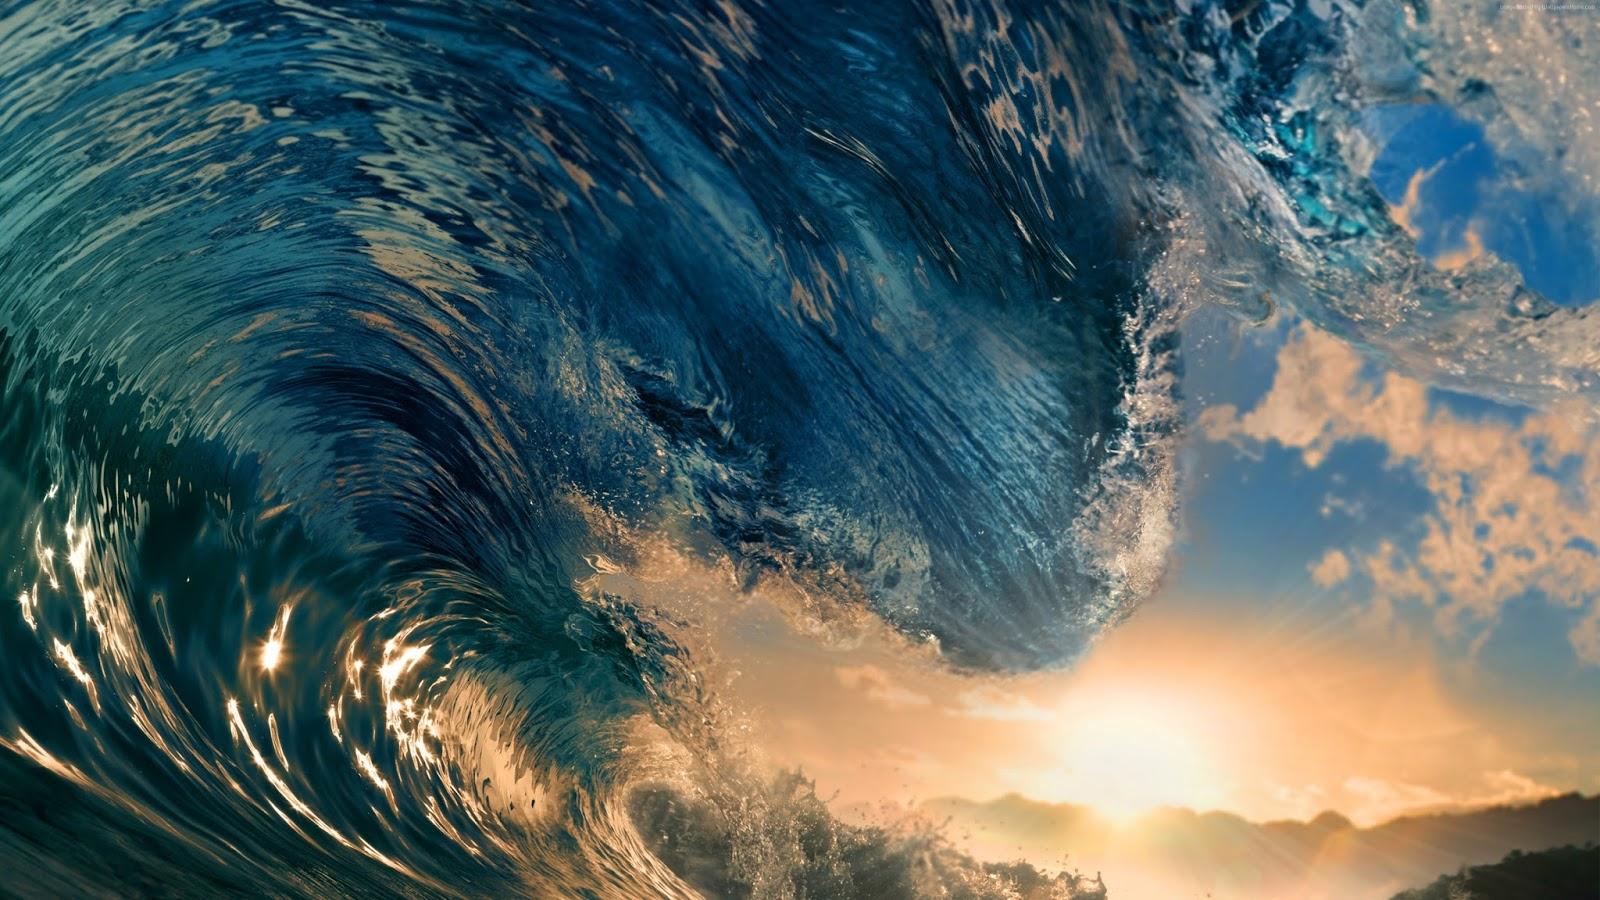 Waves Wallpaper 3840 x 2160